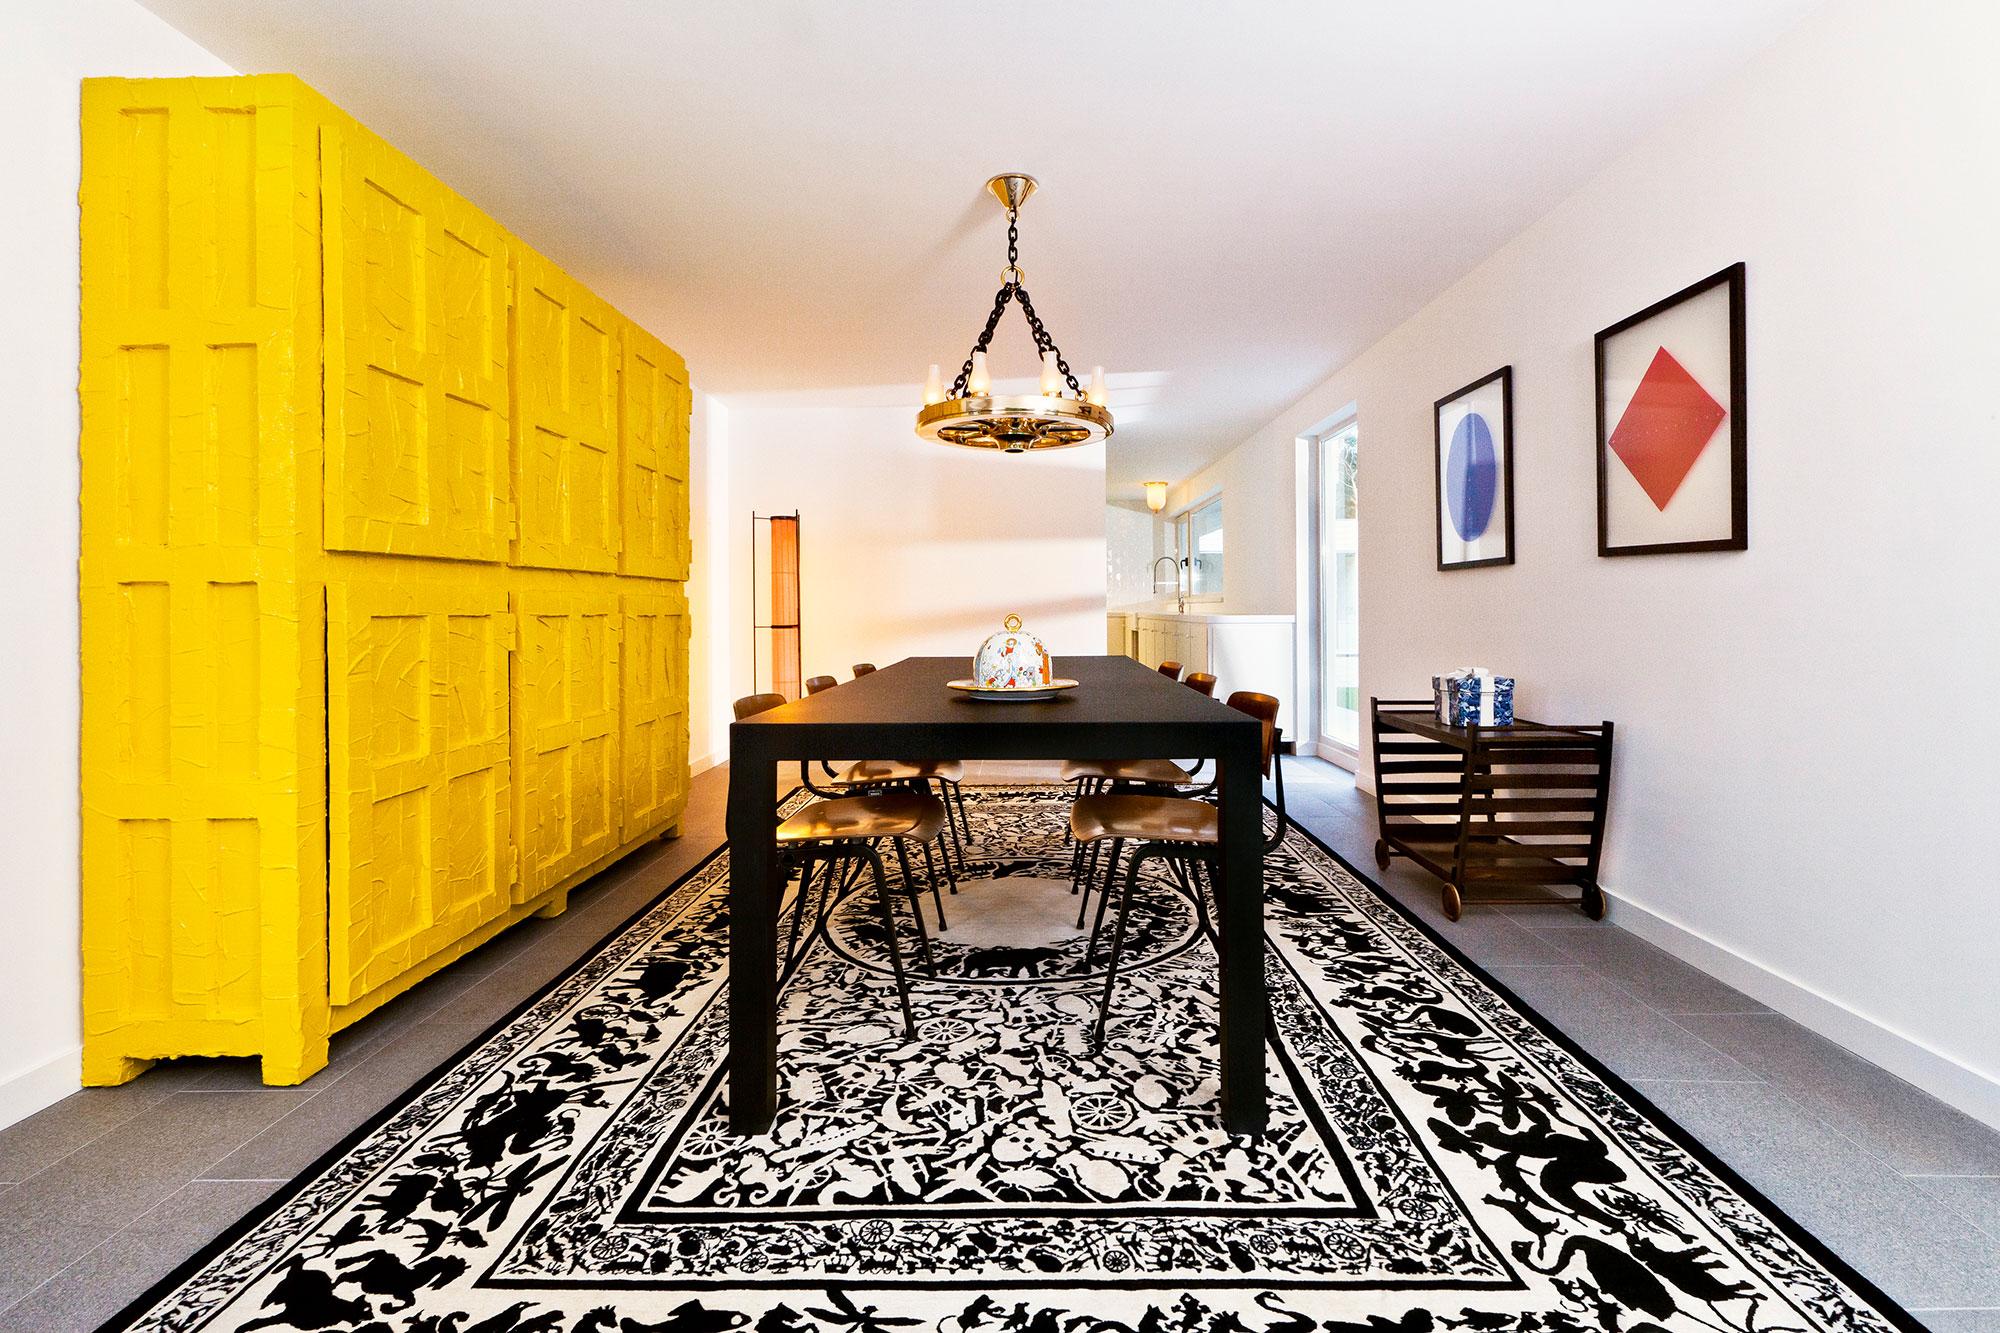 Studio-Job-House-floor0-dining